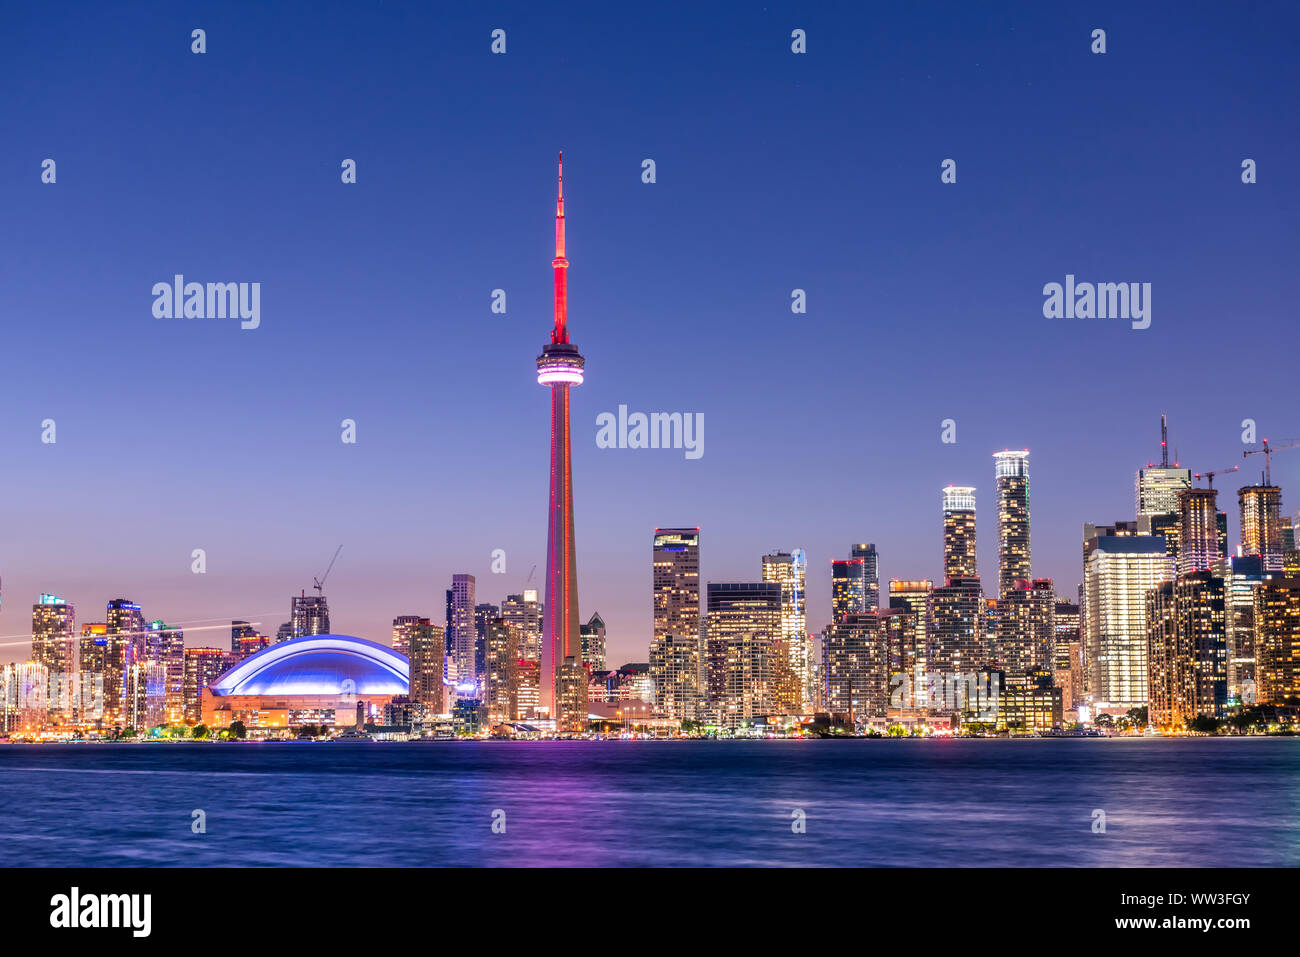 Vue sur la ville de Toronto et skyline at night, Ontario, Canada Banque D'Images